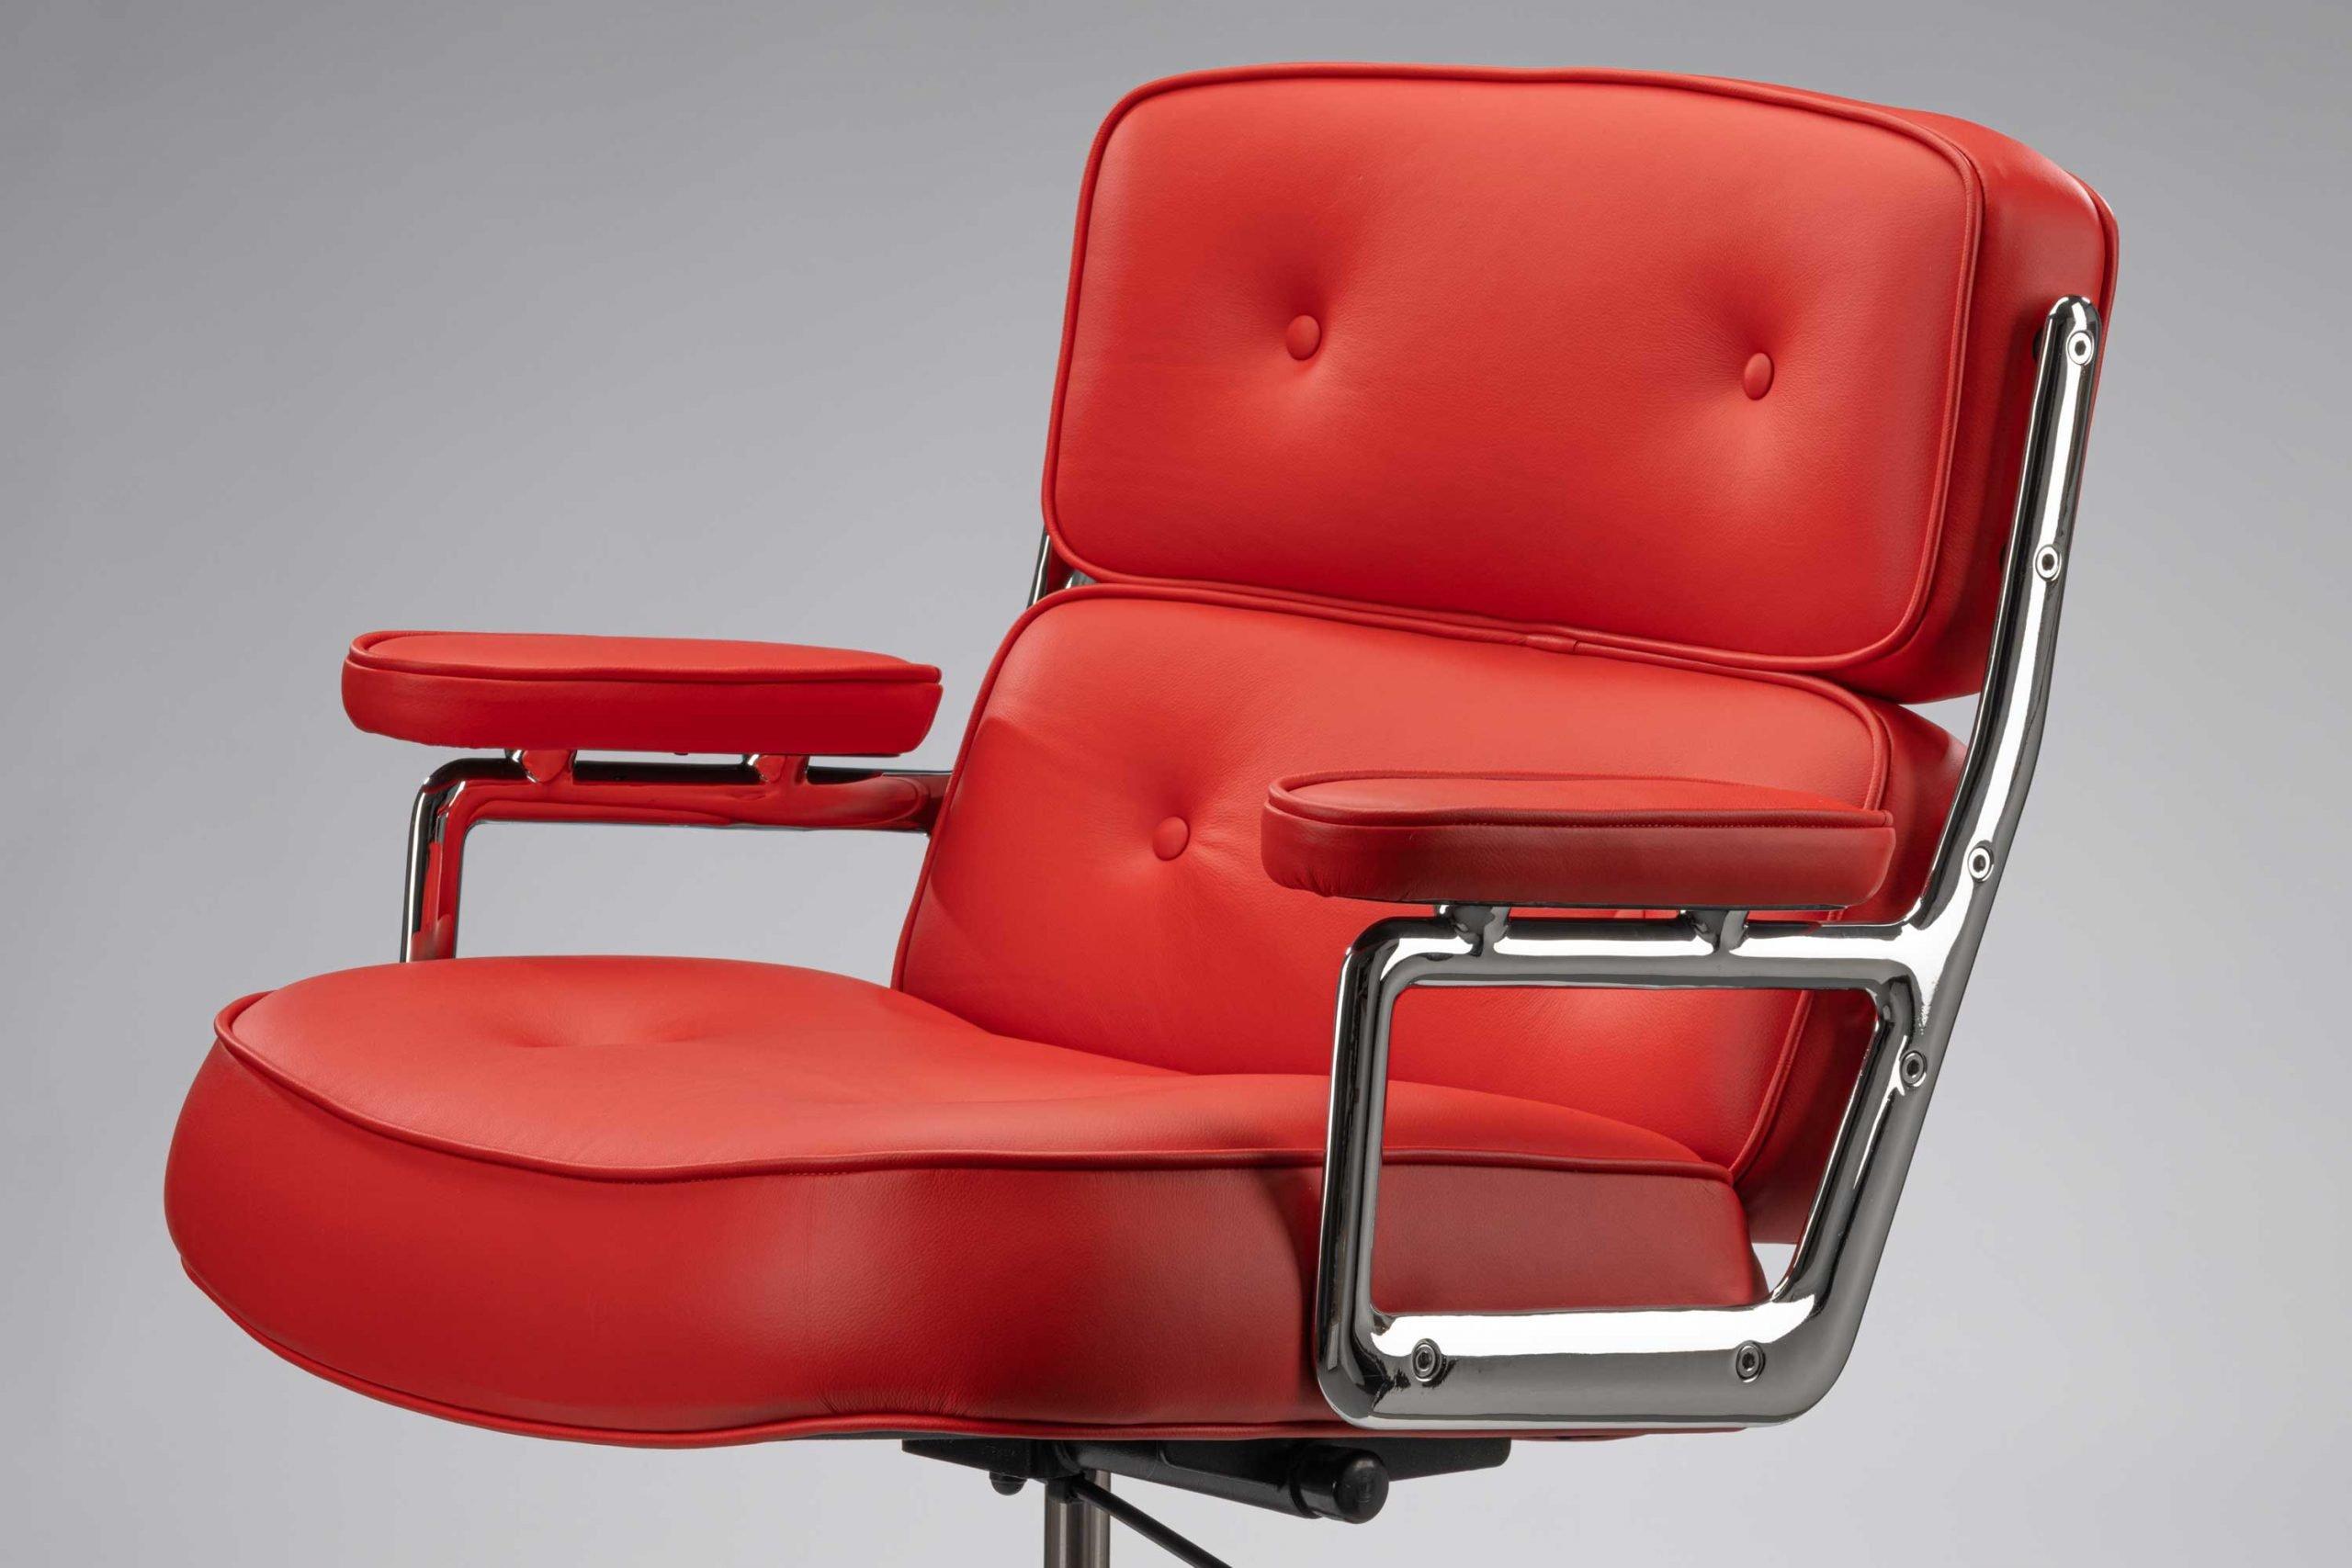 The Vitra Charles Eames 1970s Lobby Chair